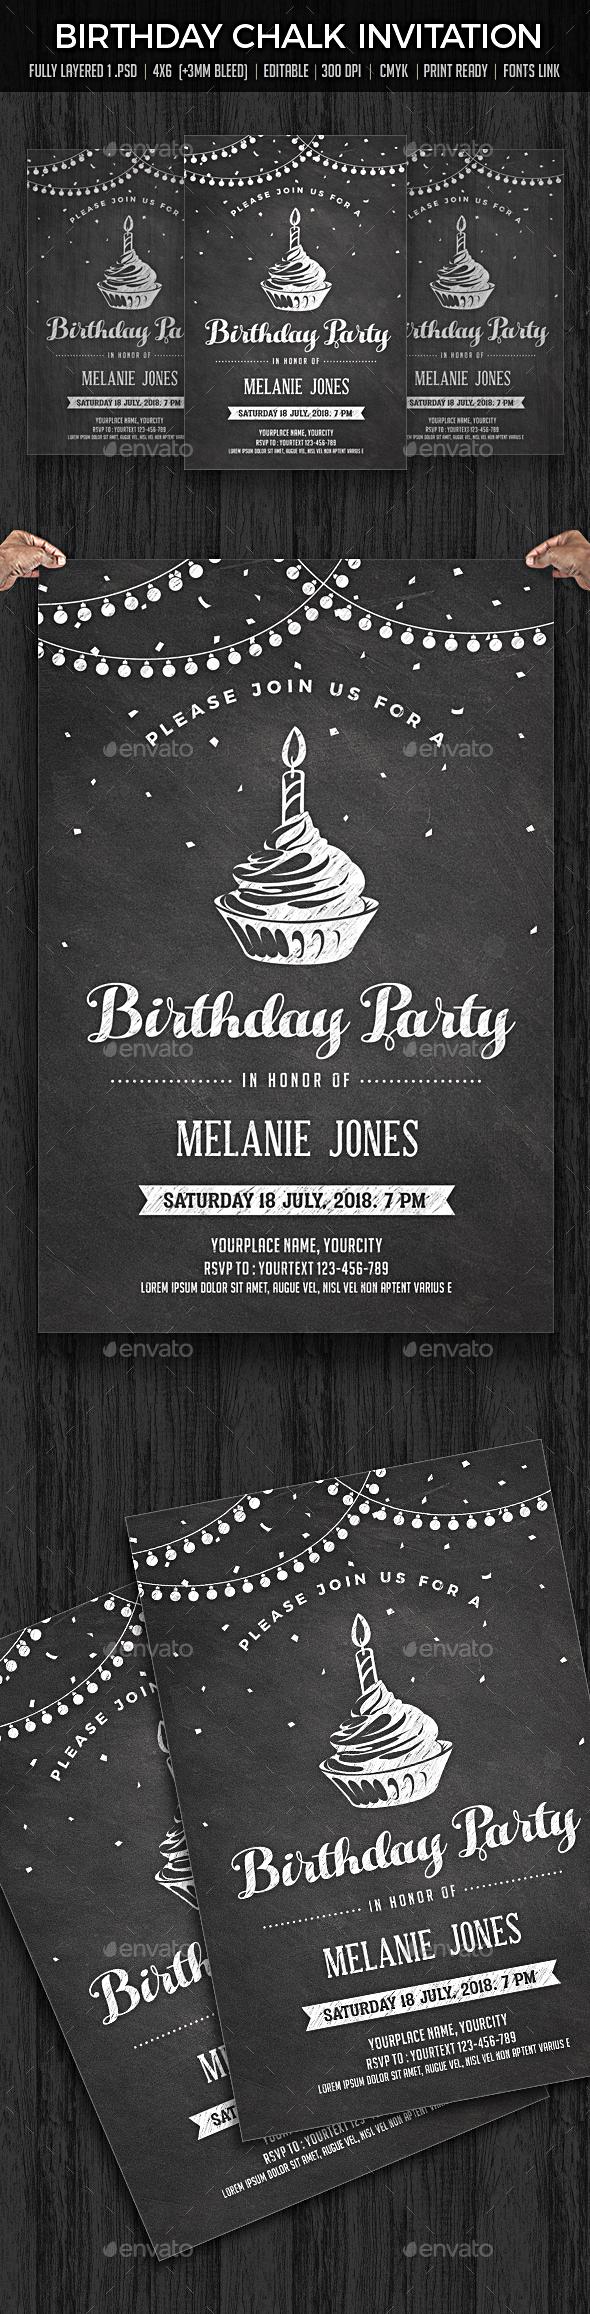 Birthday Invitation Chalk - Cards & Invites Print Templates